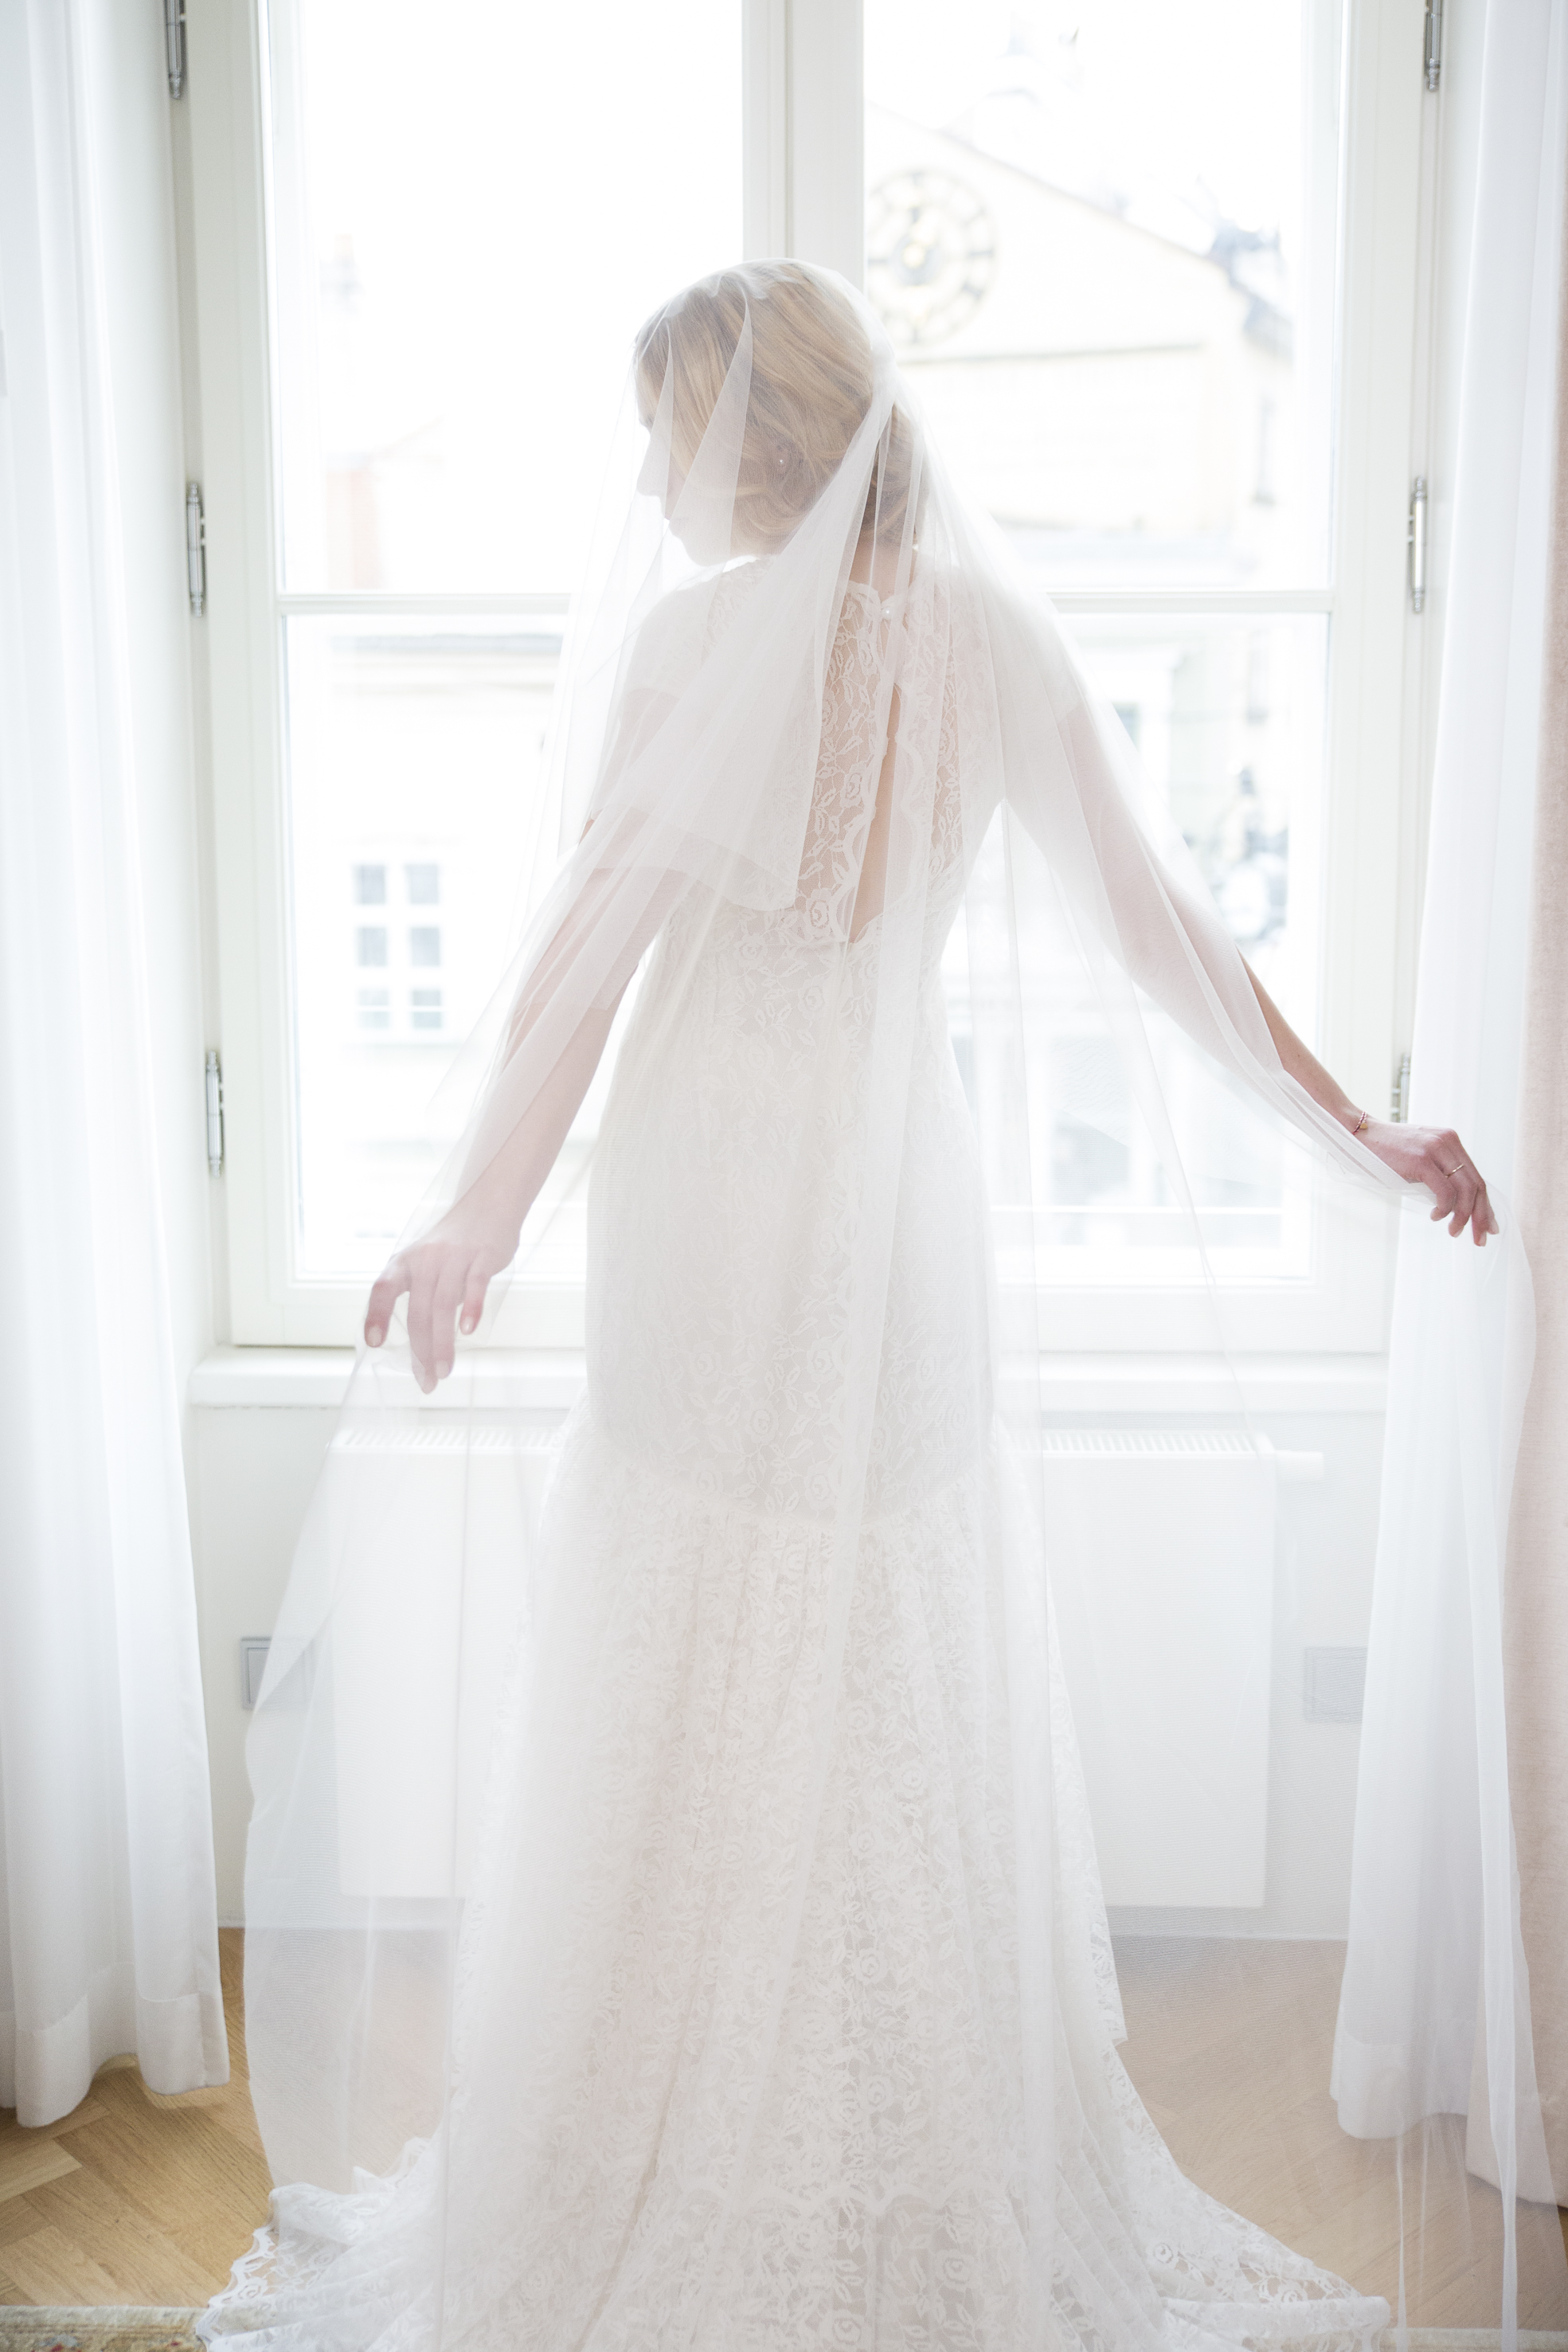 2015.03.31.Shooting_Paticia_Vincent_dress_print-557.jpg